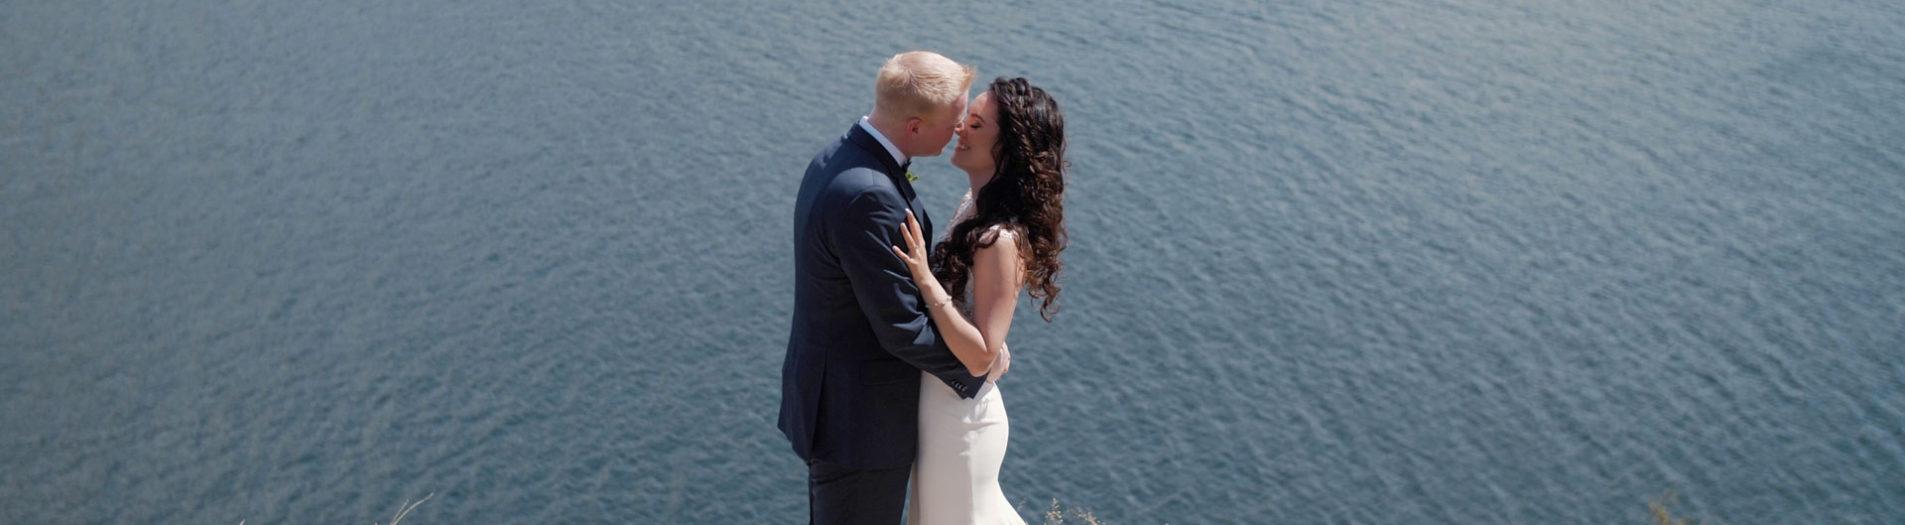 Okanagan Wedding Cinematography   Ailen + Chad   Linden Gardens, Kaleden BC